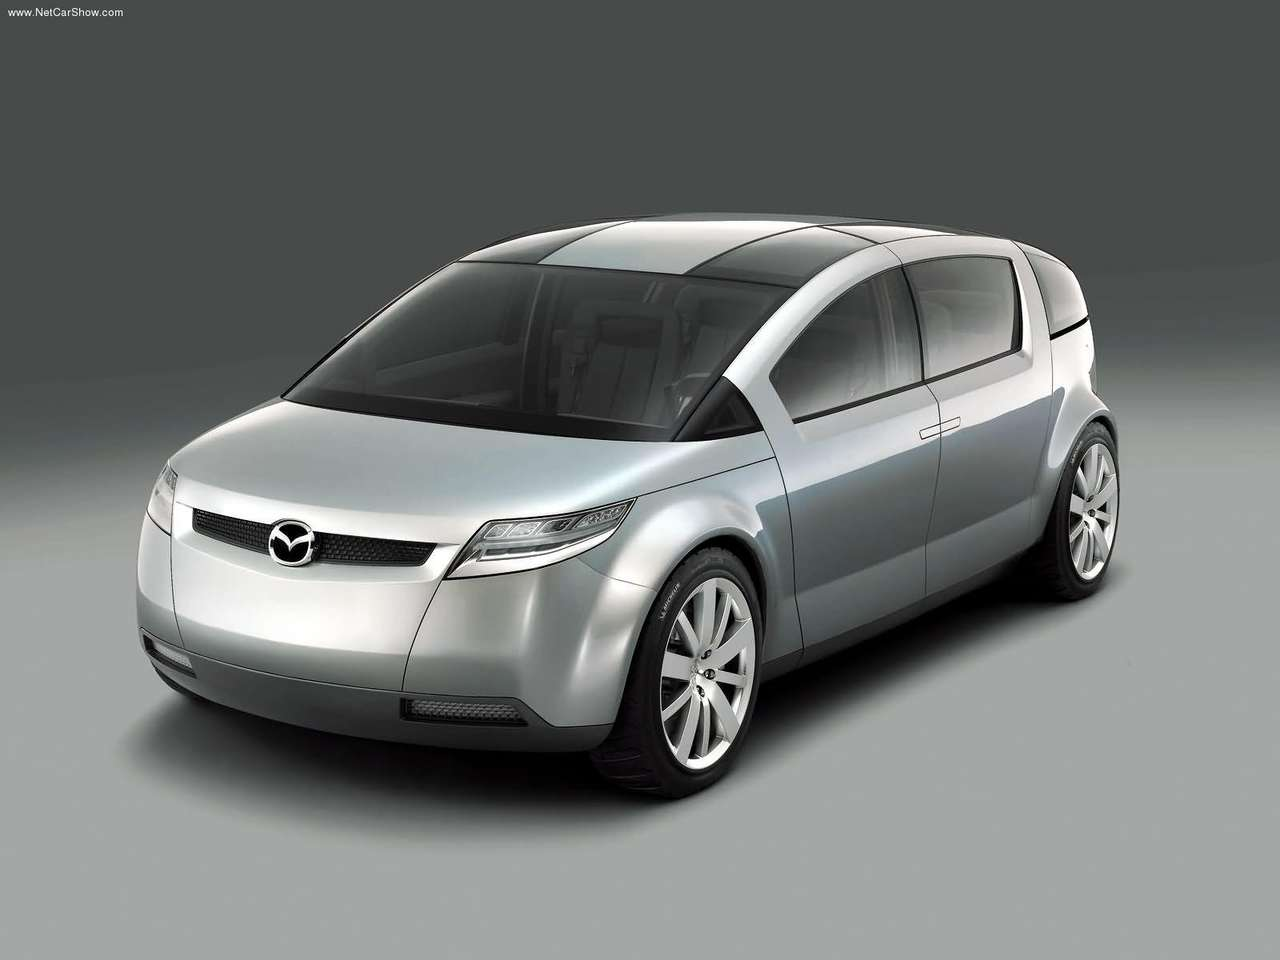 http://3.bp.blogspot.com/-BoU03Z7-X7s/TbZ6kMsKYtI/AAAAAAAAGPQ/TkRCnpXDIx4/s1600/Mazda-Washu_Concept_2003_1280x960_wallpaper_01.jpg